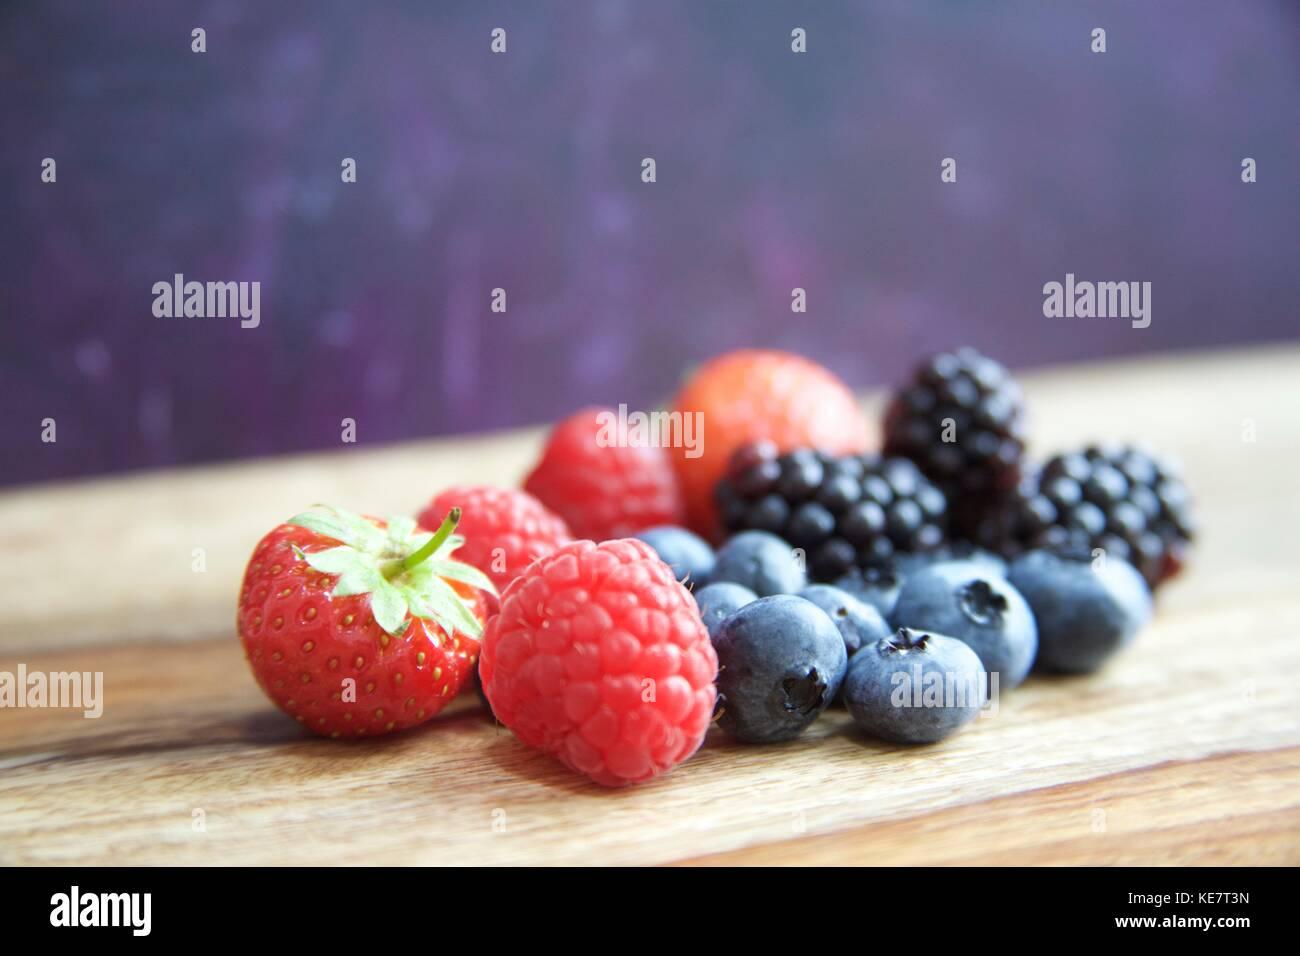 Gotta love berries - Stock Image